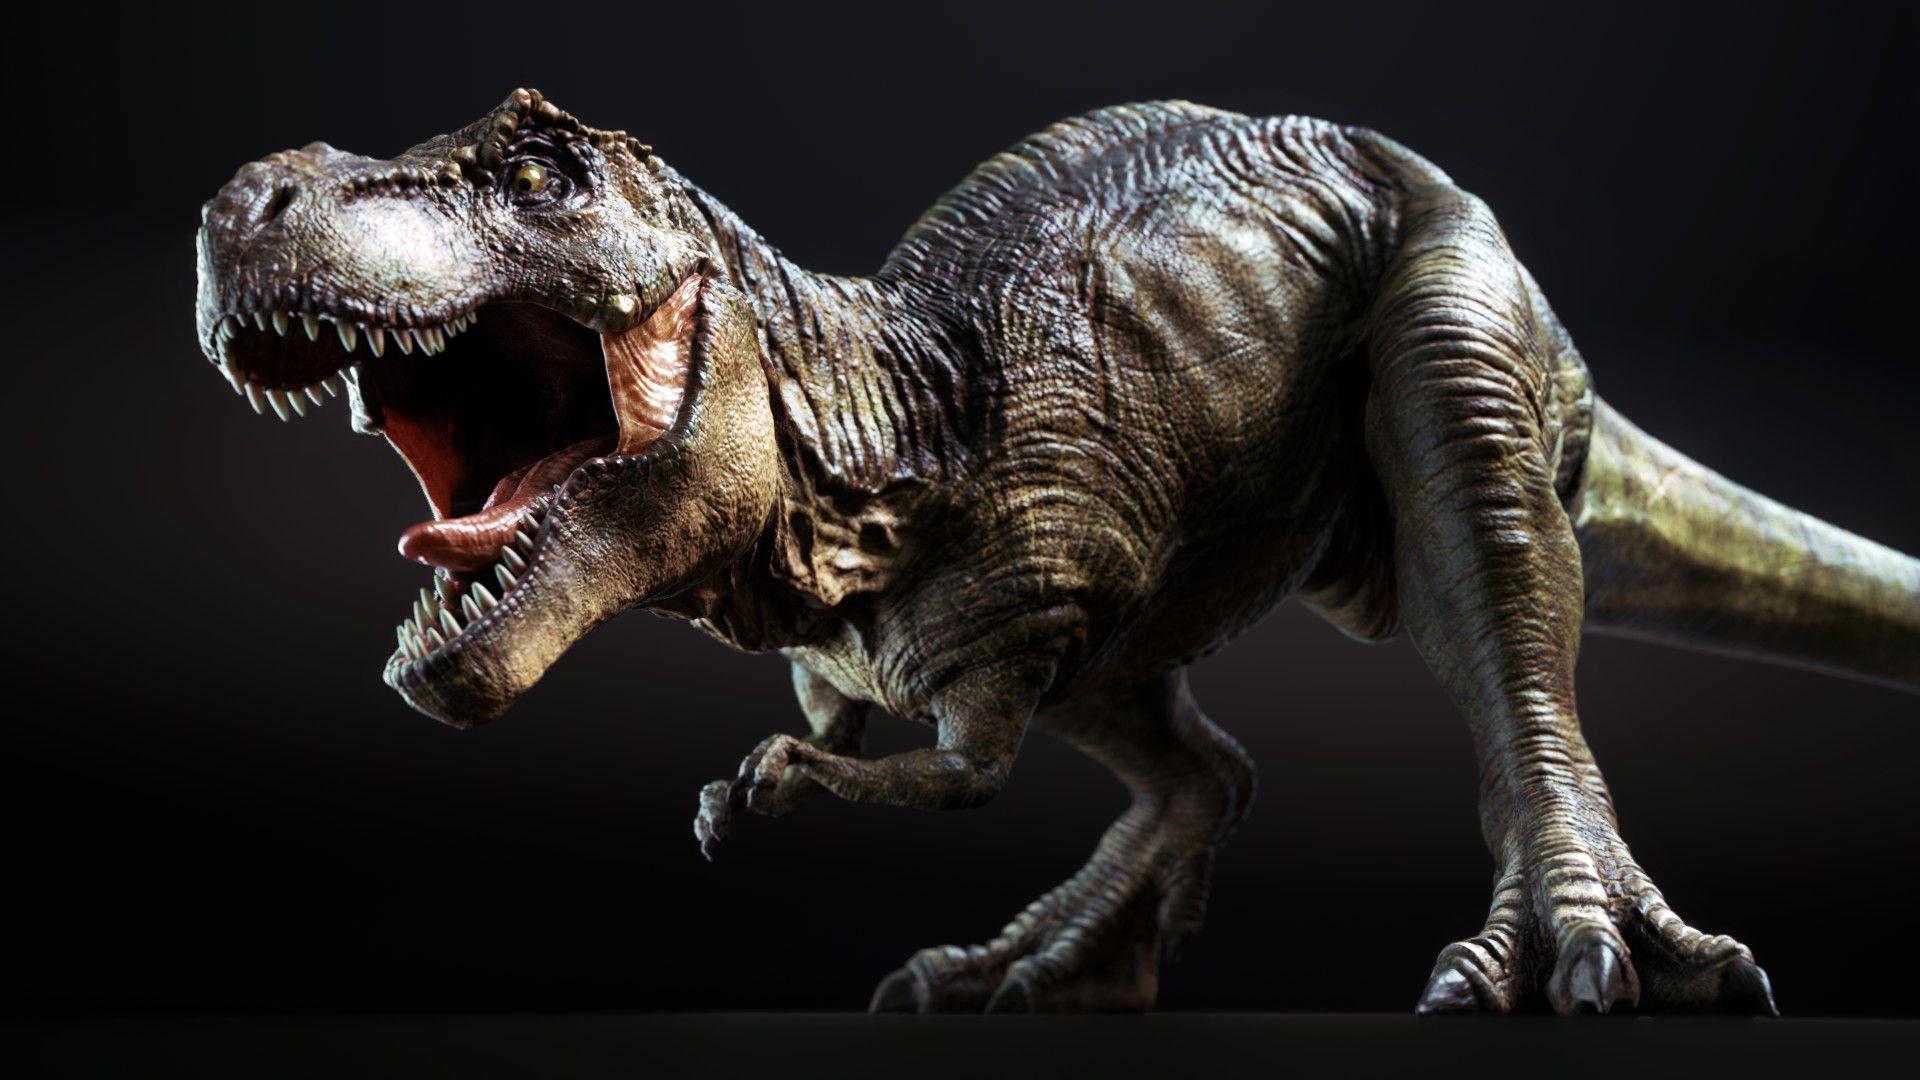 Картинка динозавр тираннозавр рекс